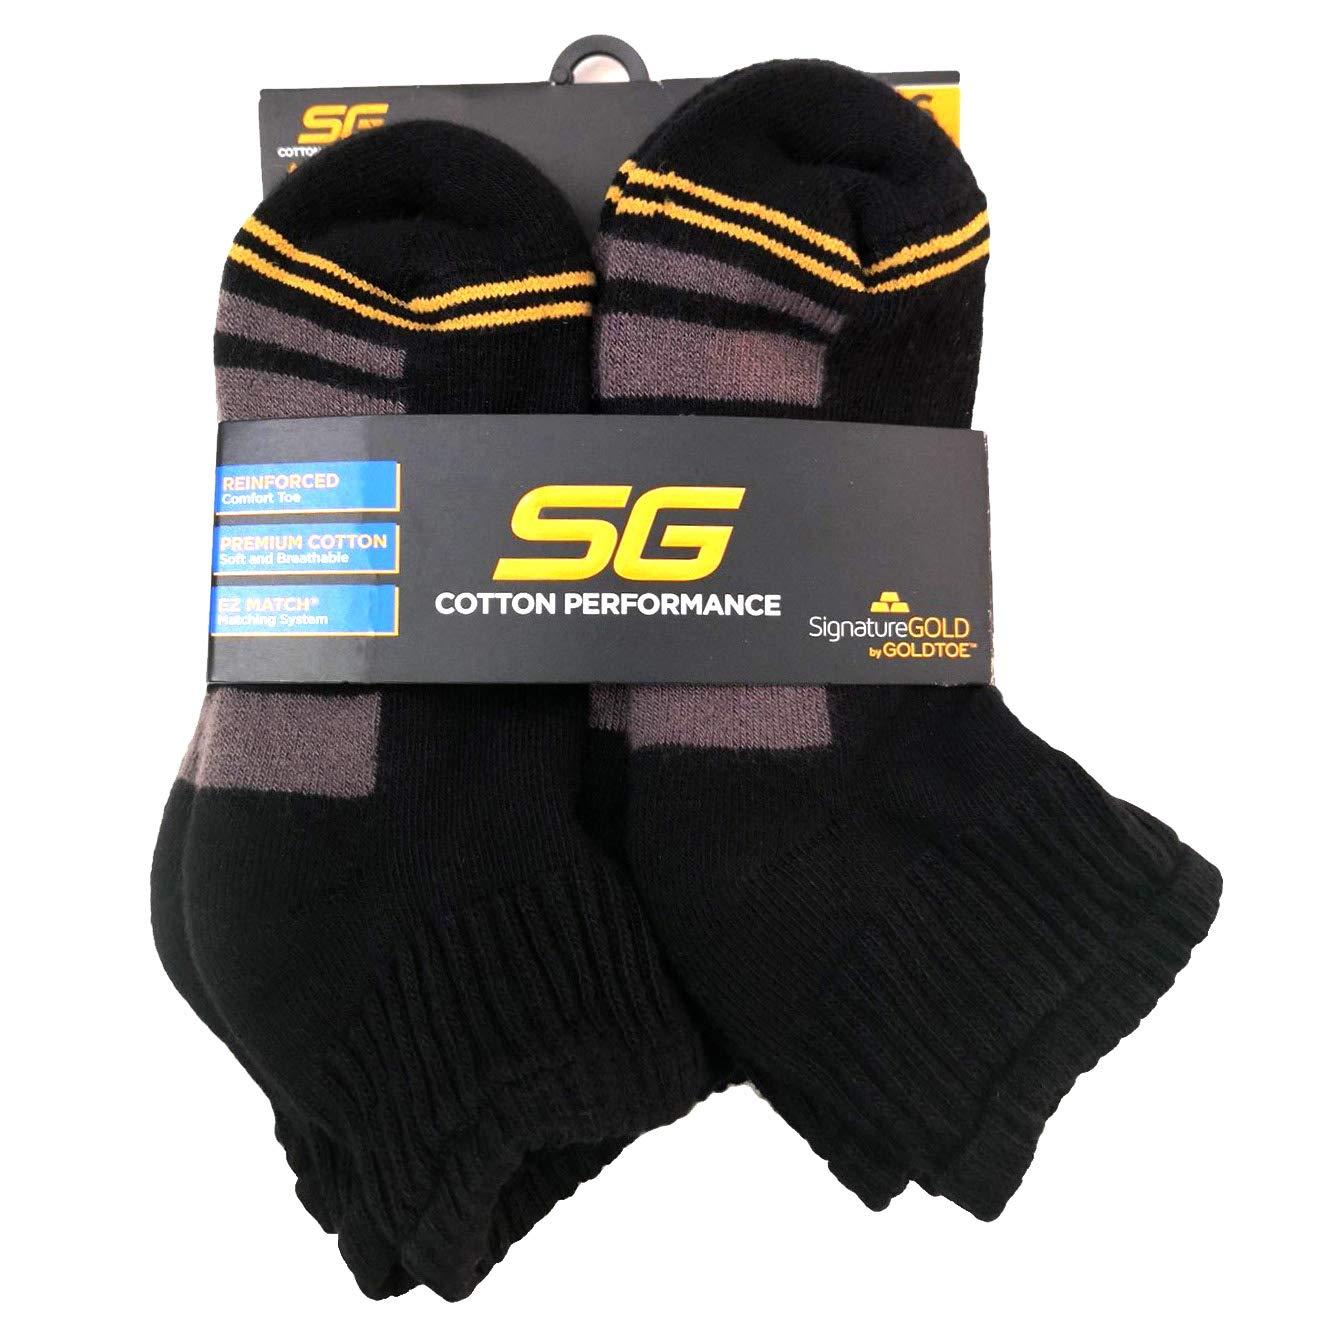 Boys GOLDTOE Cotton Performance Ankle Socks 6 Pairs Black Size M